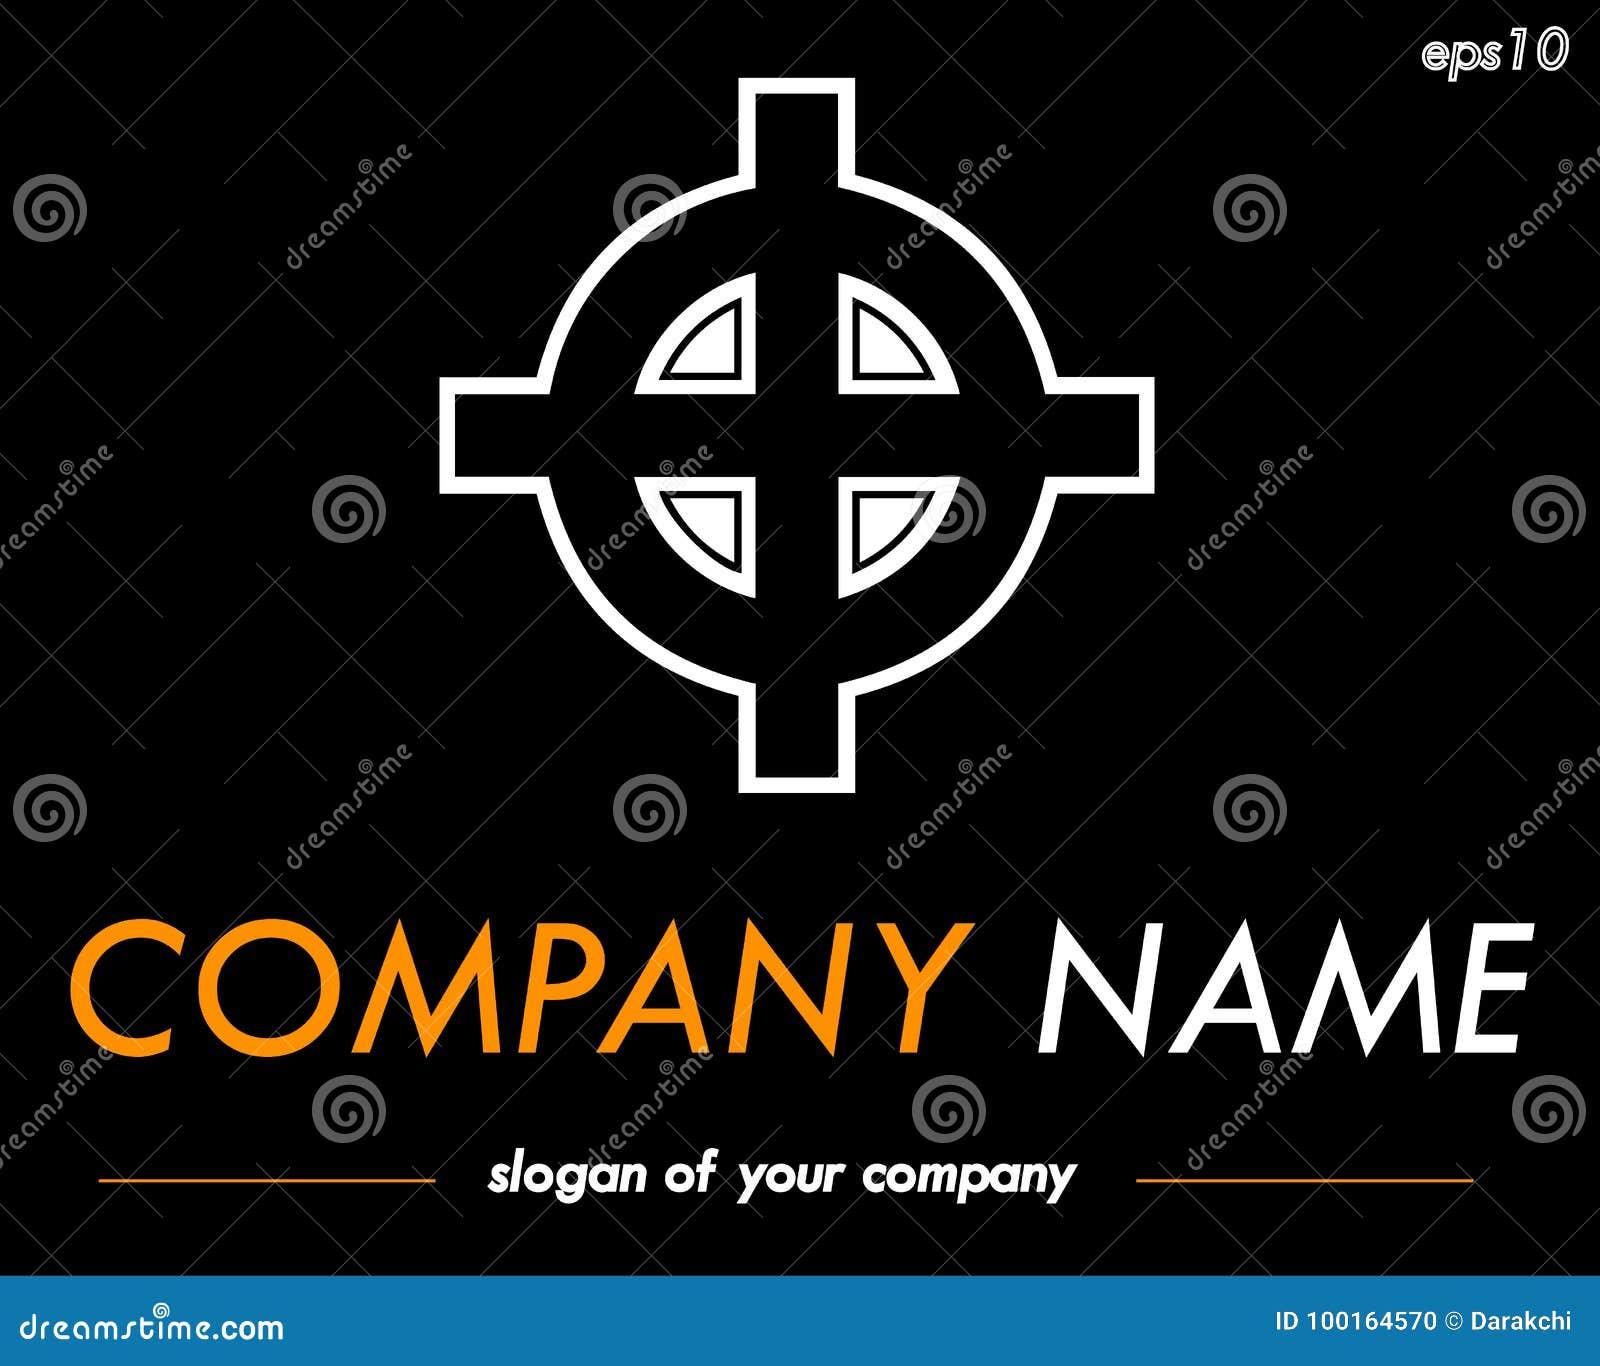 Celtic Cross Vector Logo Template Ready Logotype For A Company